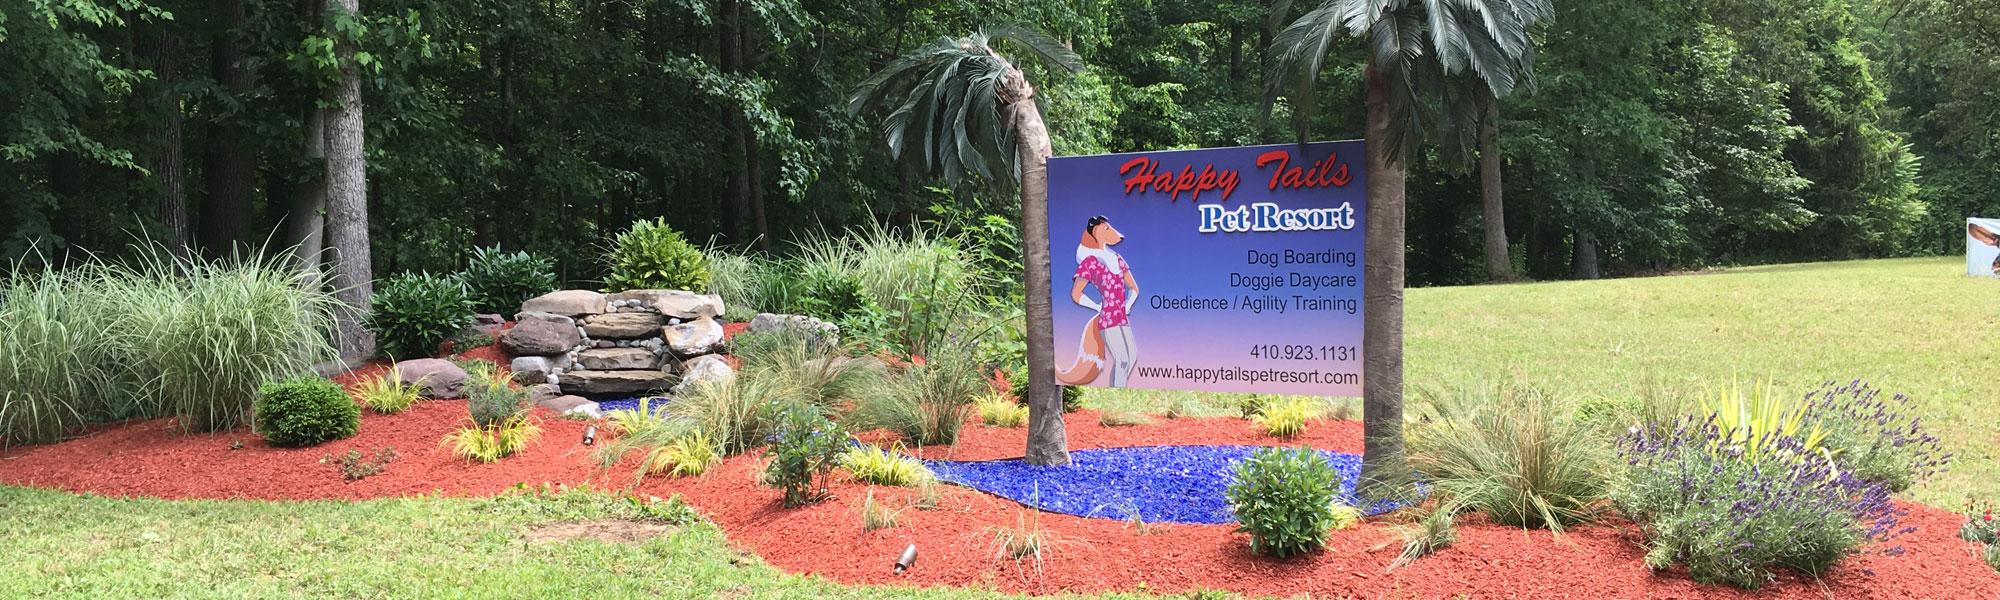 Nassau All Inclusive Resorts